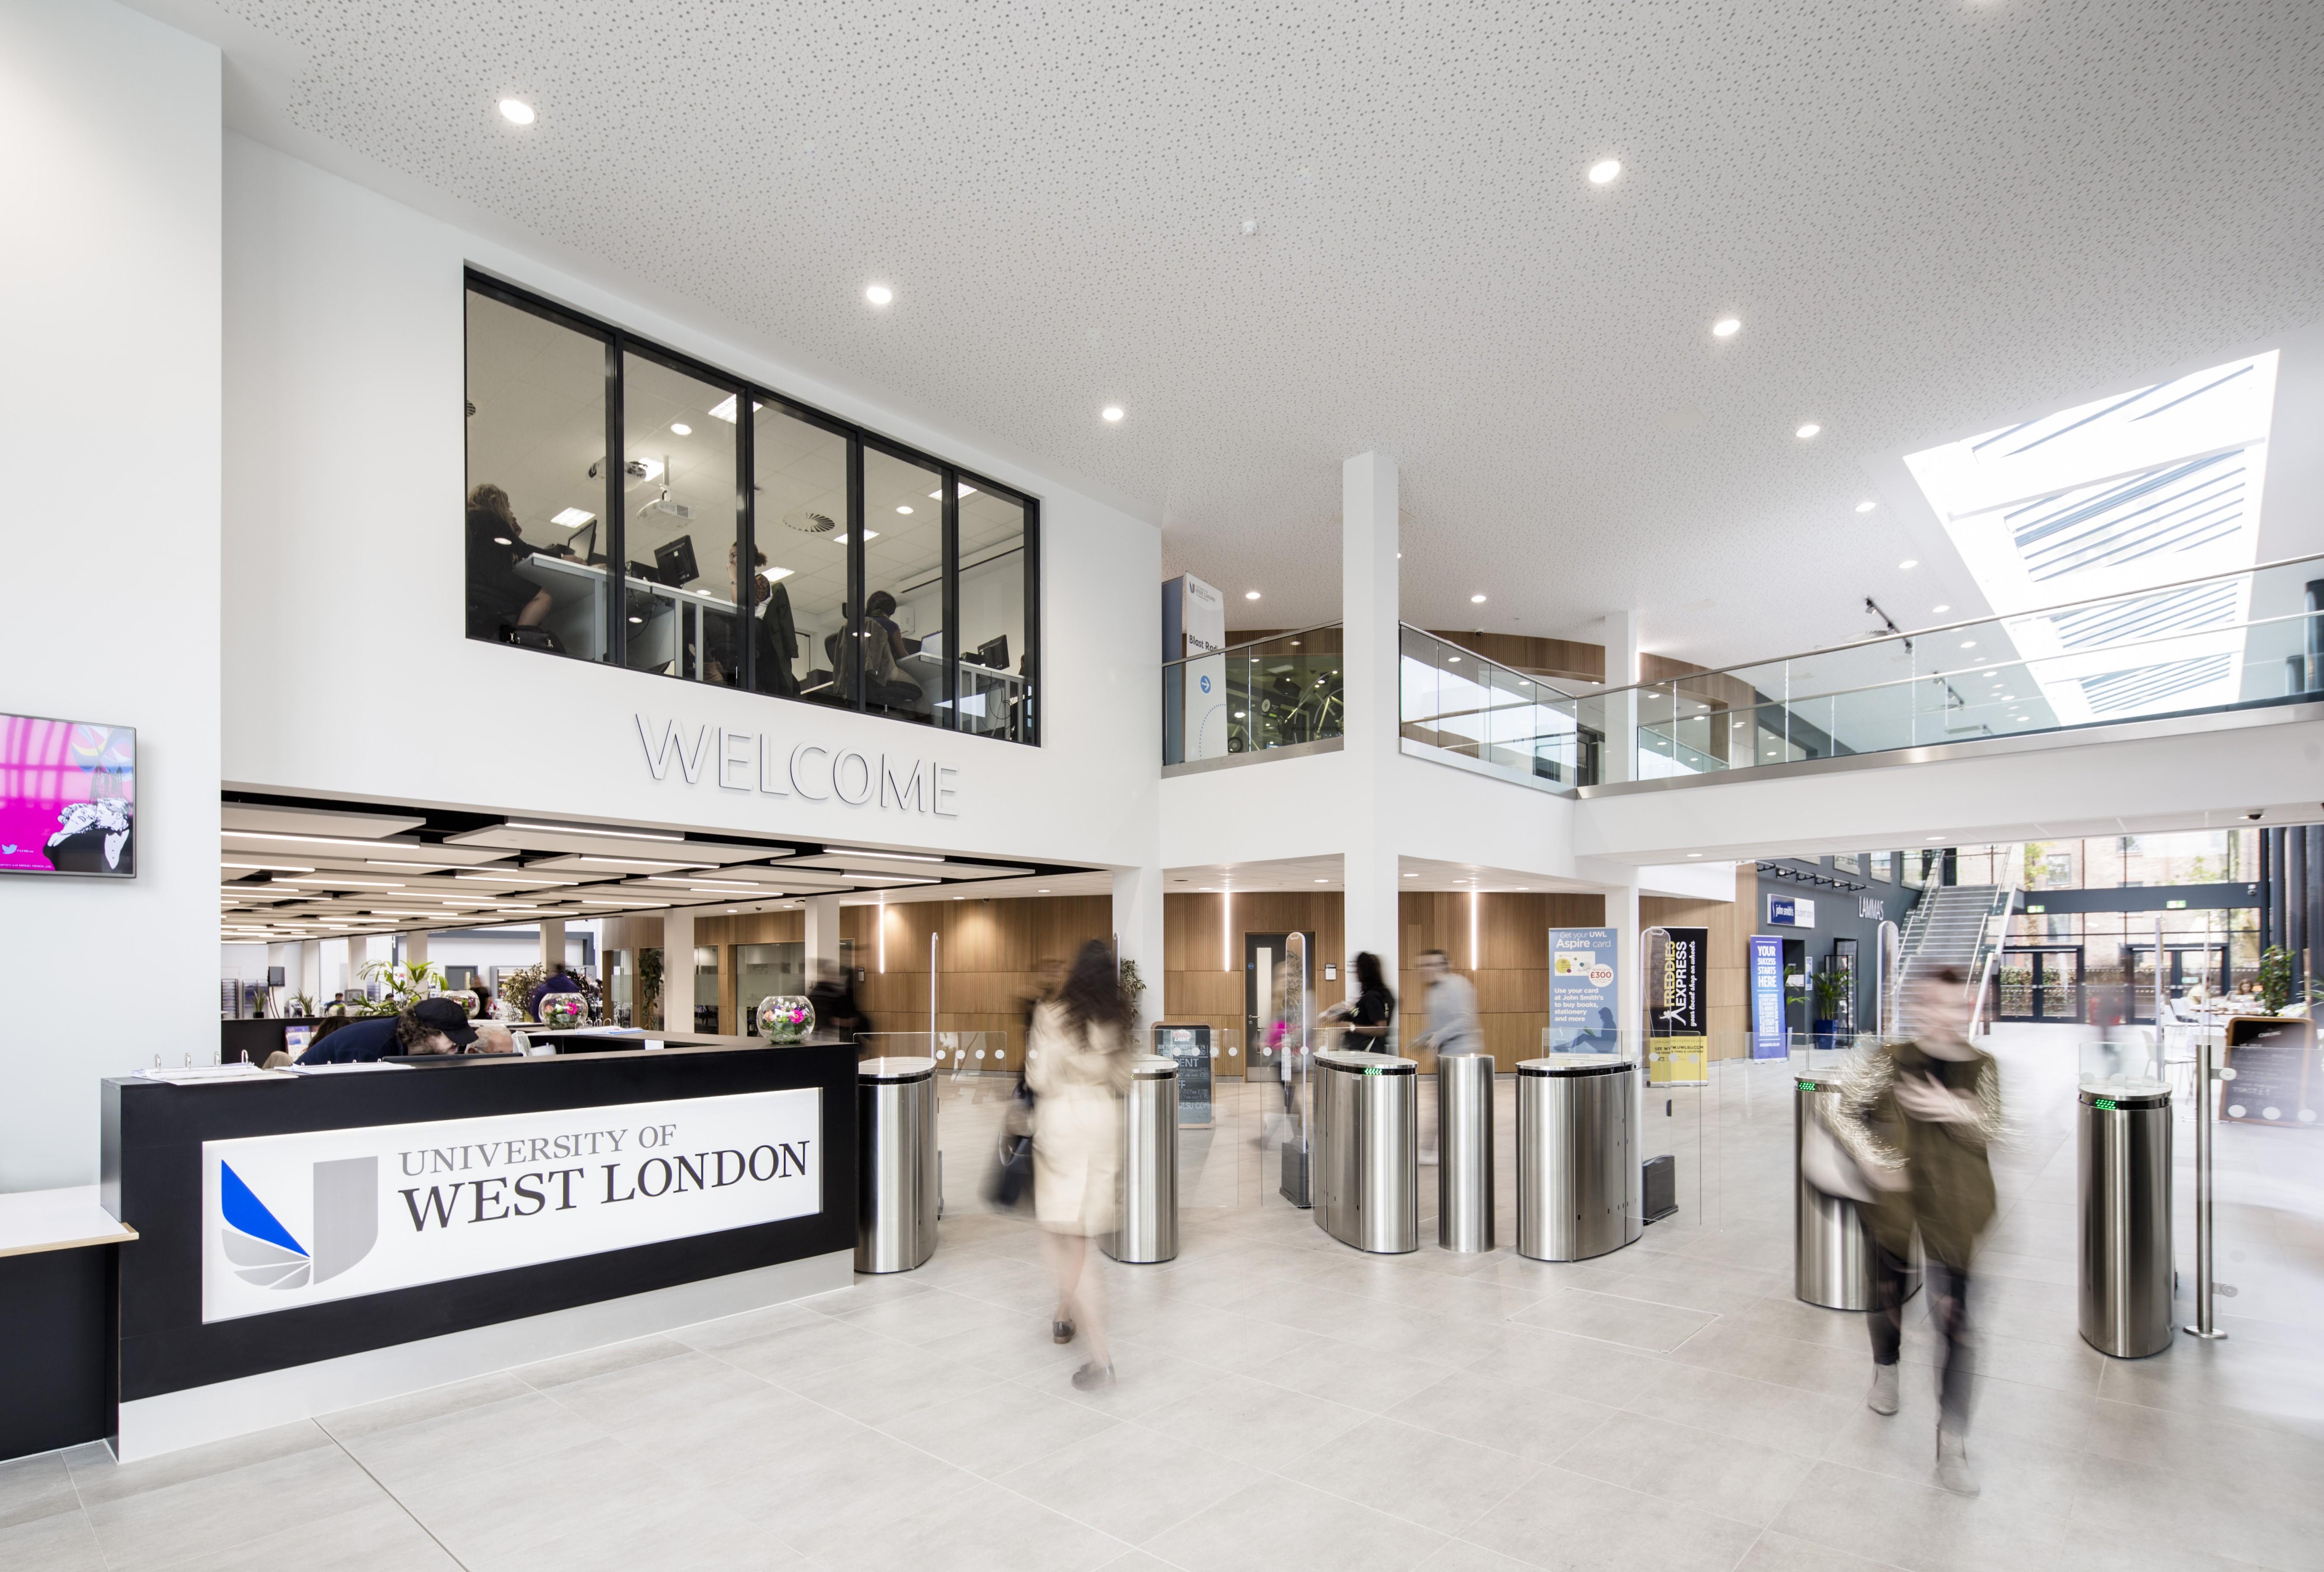 University of West London | LinkedIn